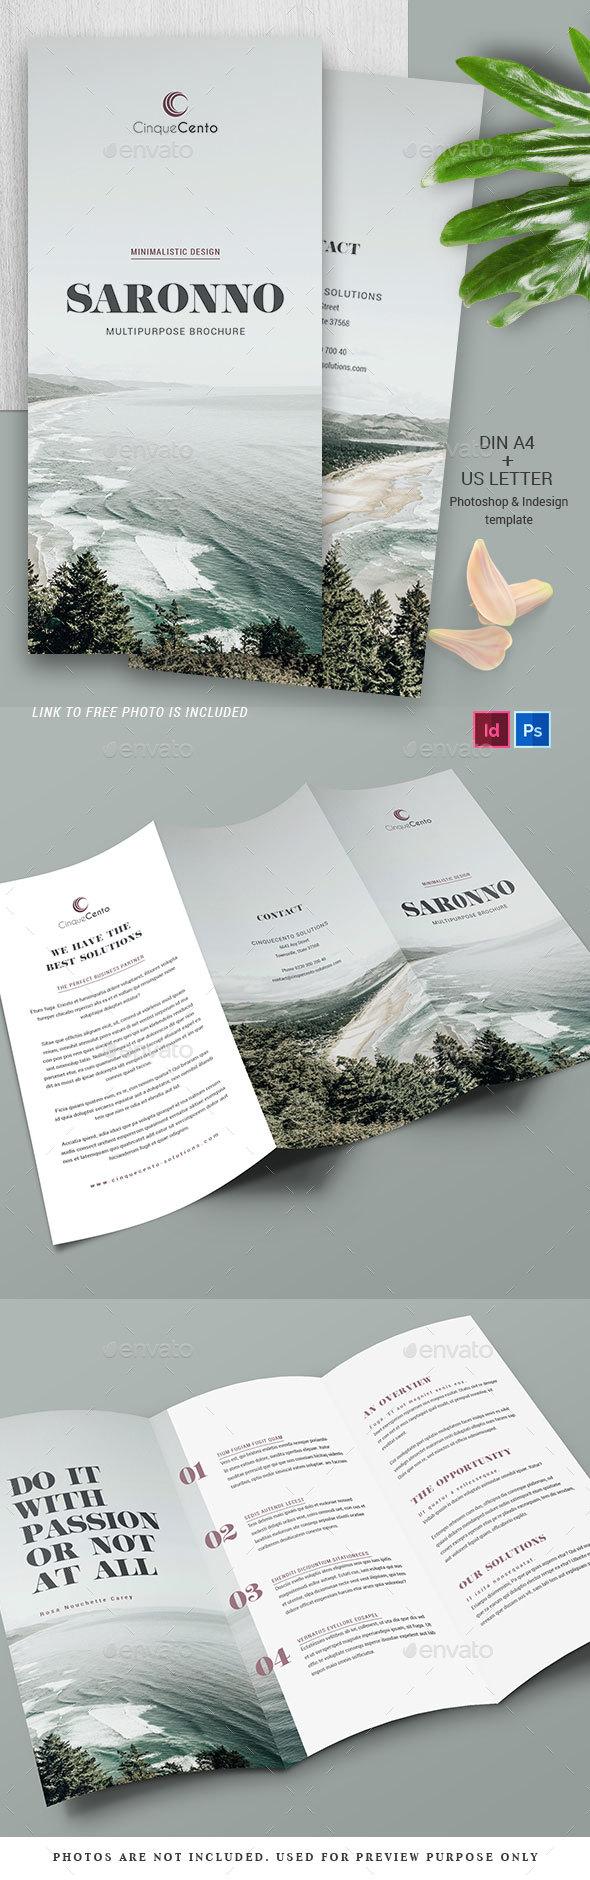 Multipurpose Trifold Brochure - Vol.2 - Brochures Print Templates